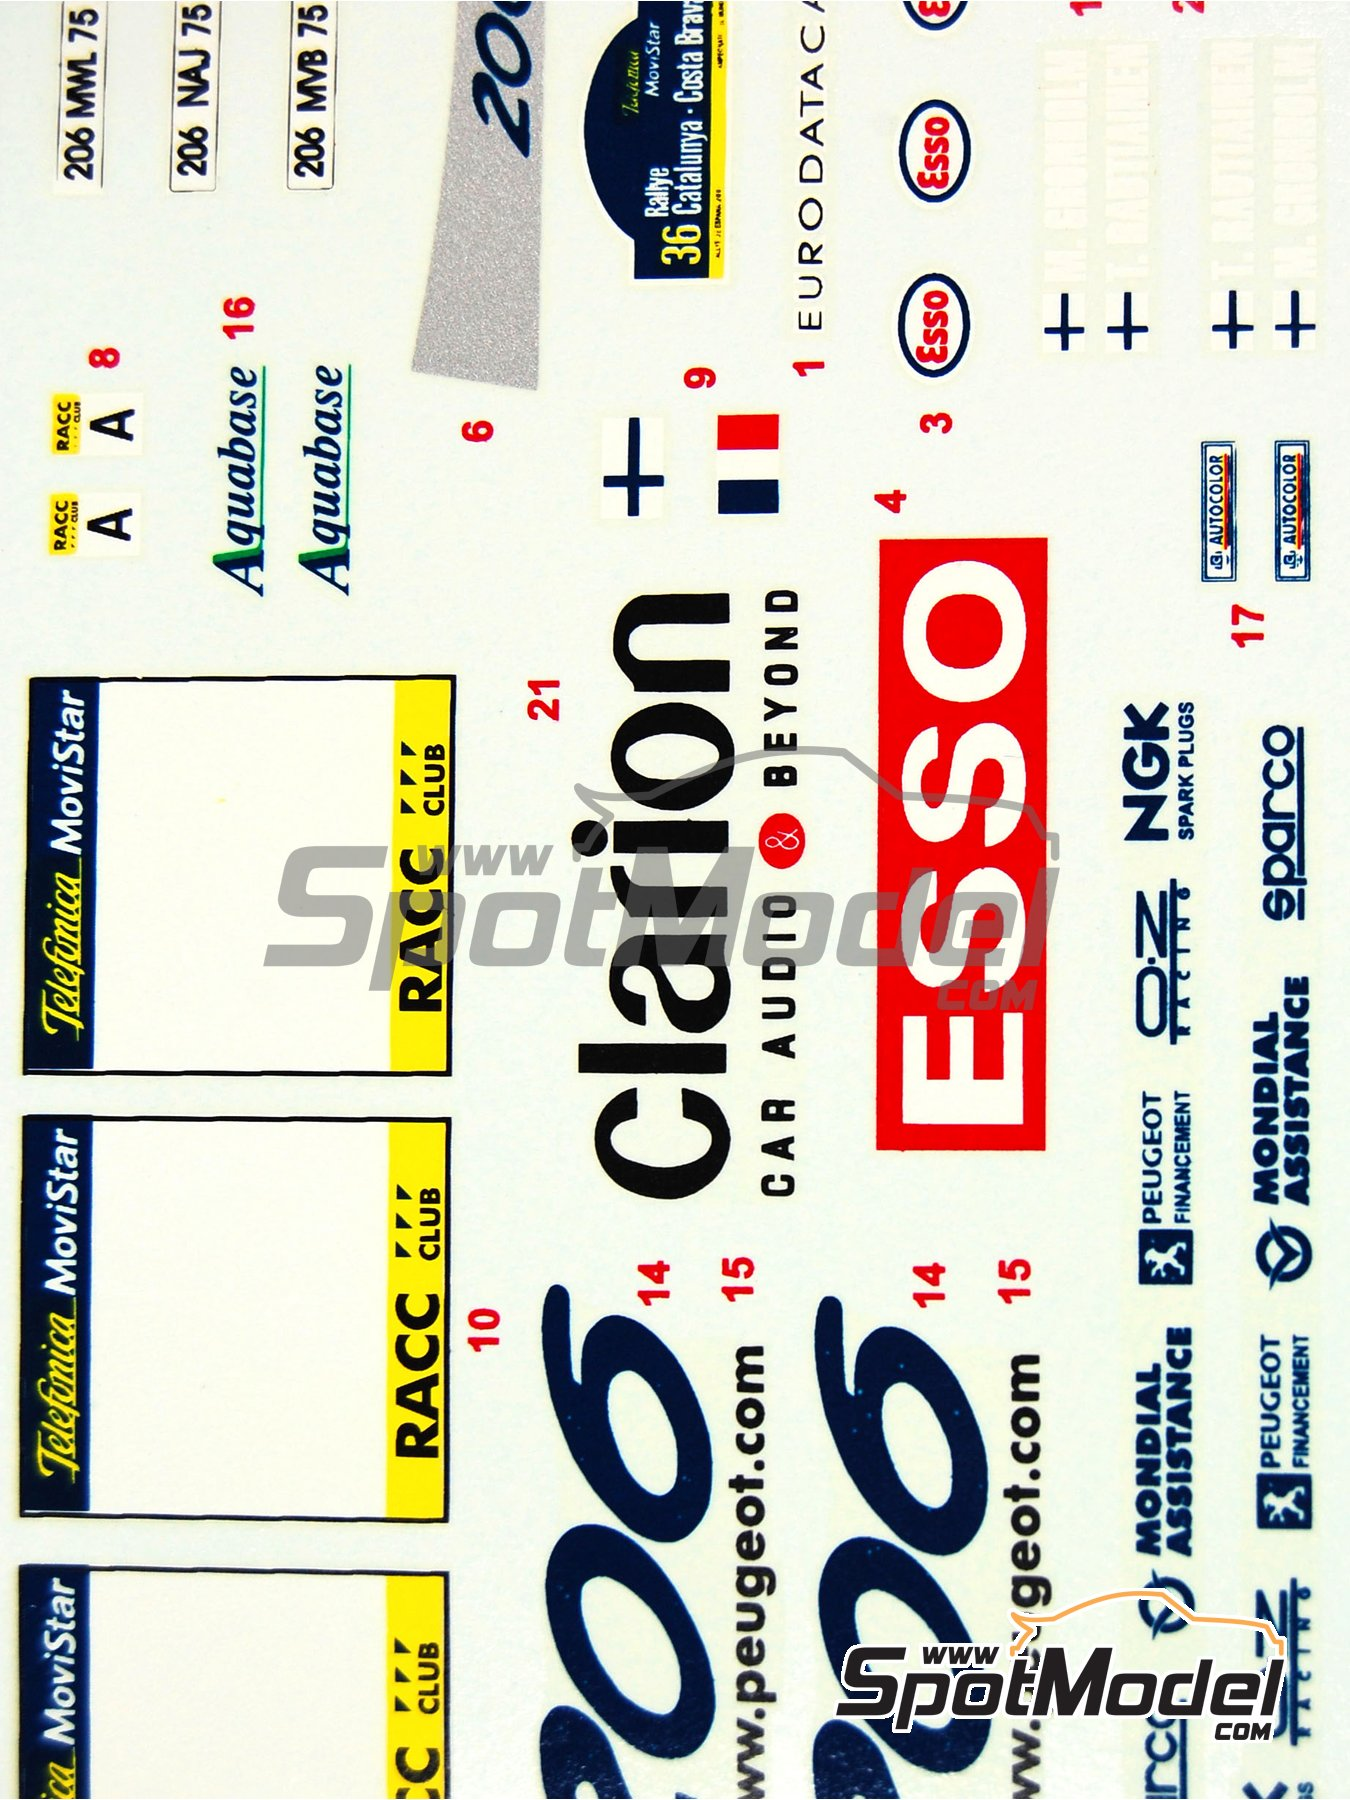 Peugeot 206 WRC Esso Ultron Clarion - Rally de Cataluña Costa Dorada RACC 2000 | Calcas de agua en escala1/24 fabricado por Reji Model (ref.REJI-031) image